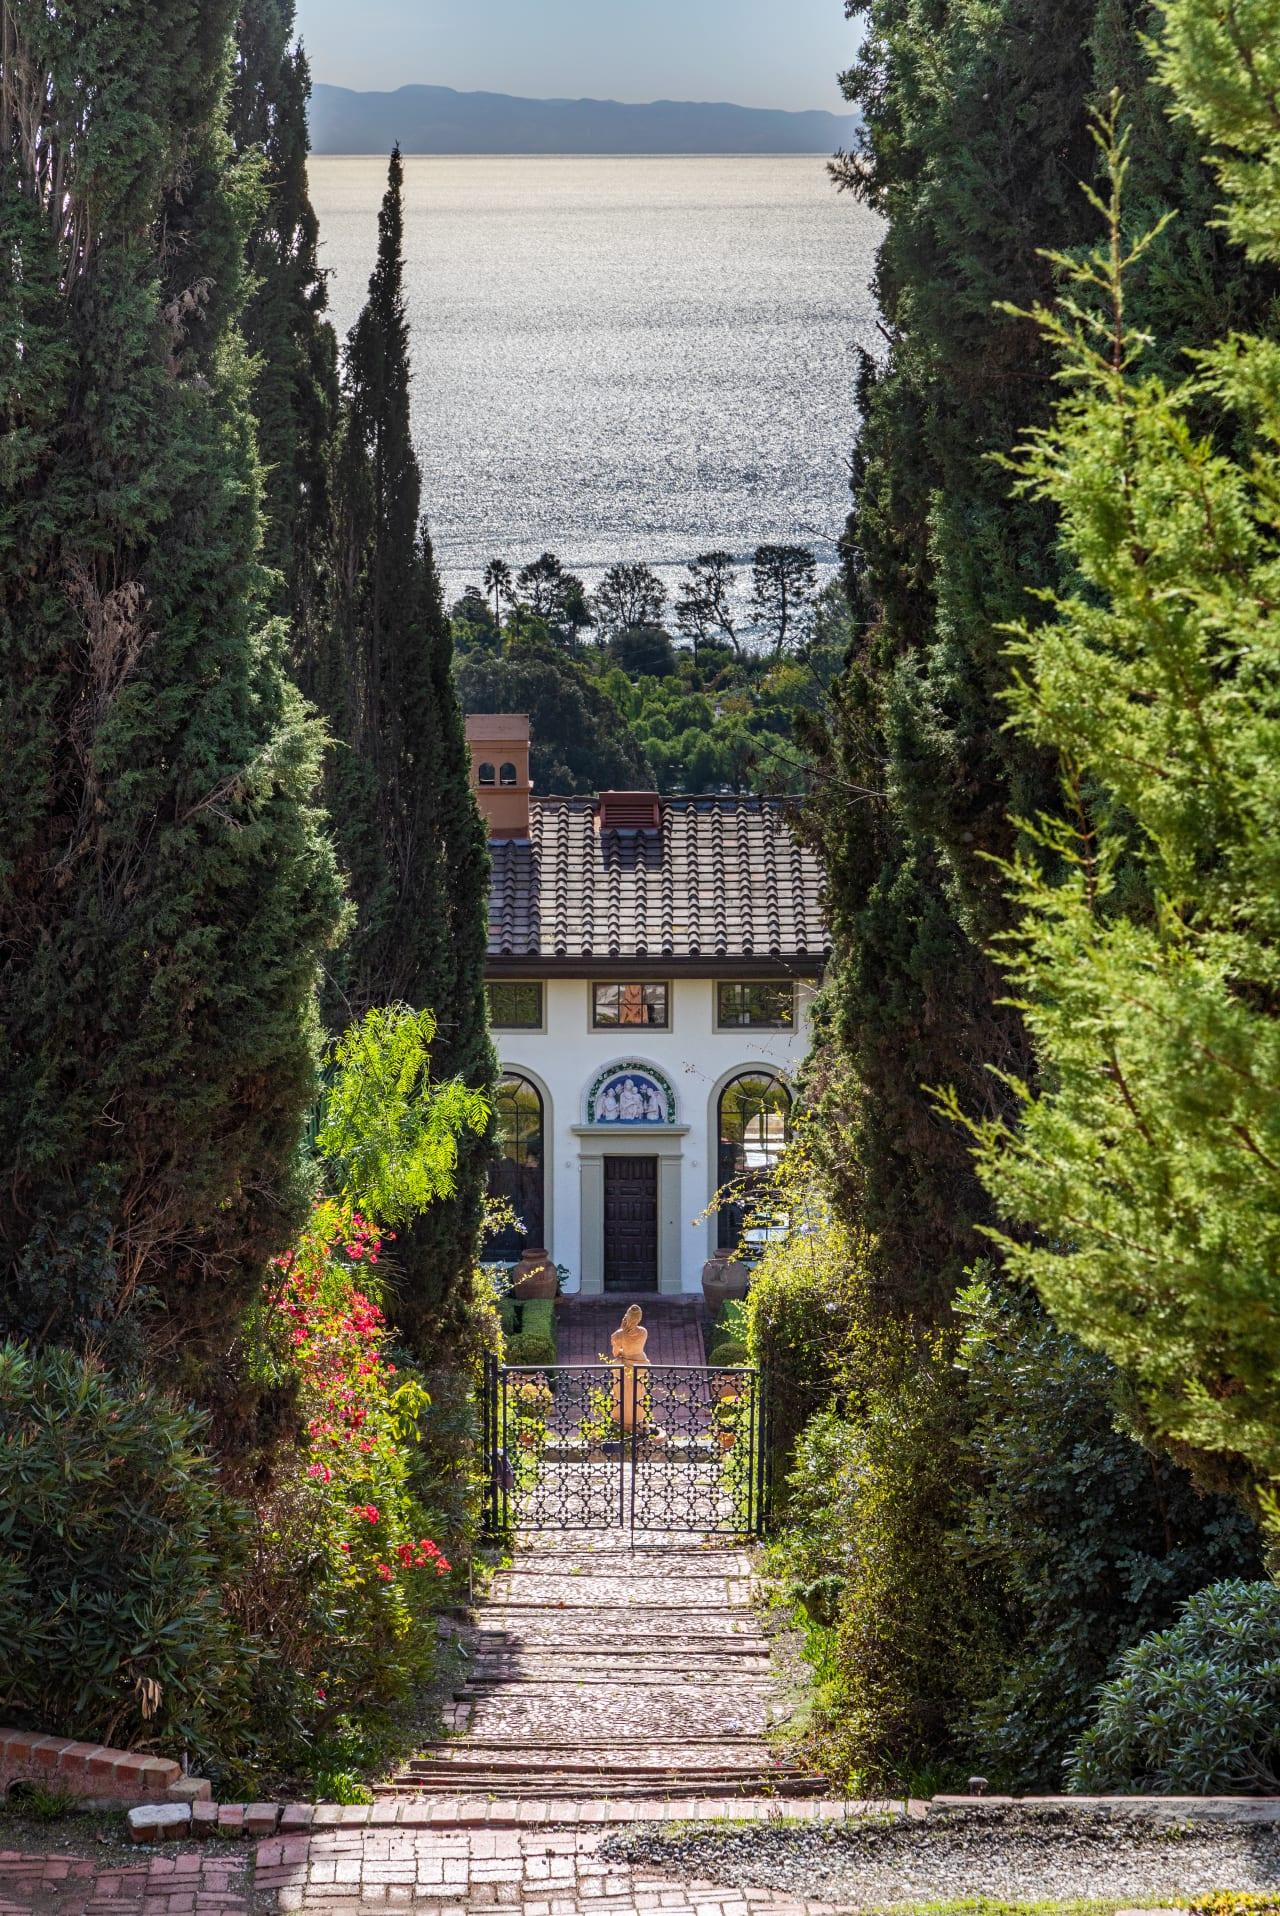 Villa Narcissa - The Peninsula's Crown Jewel